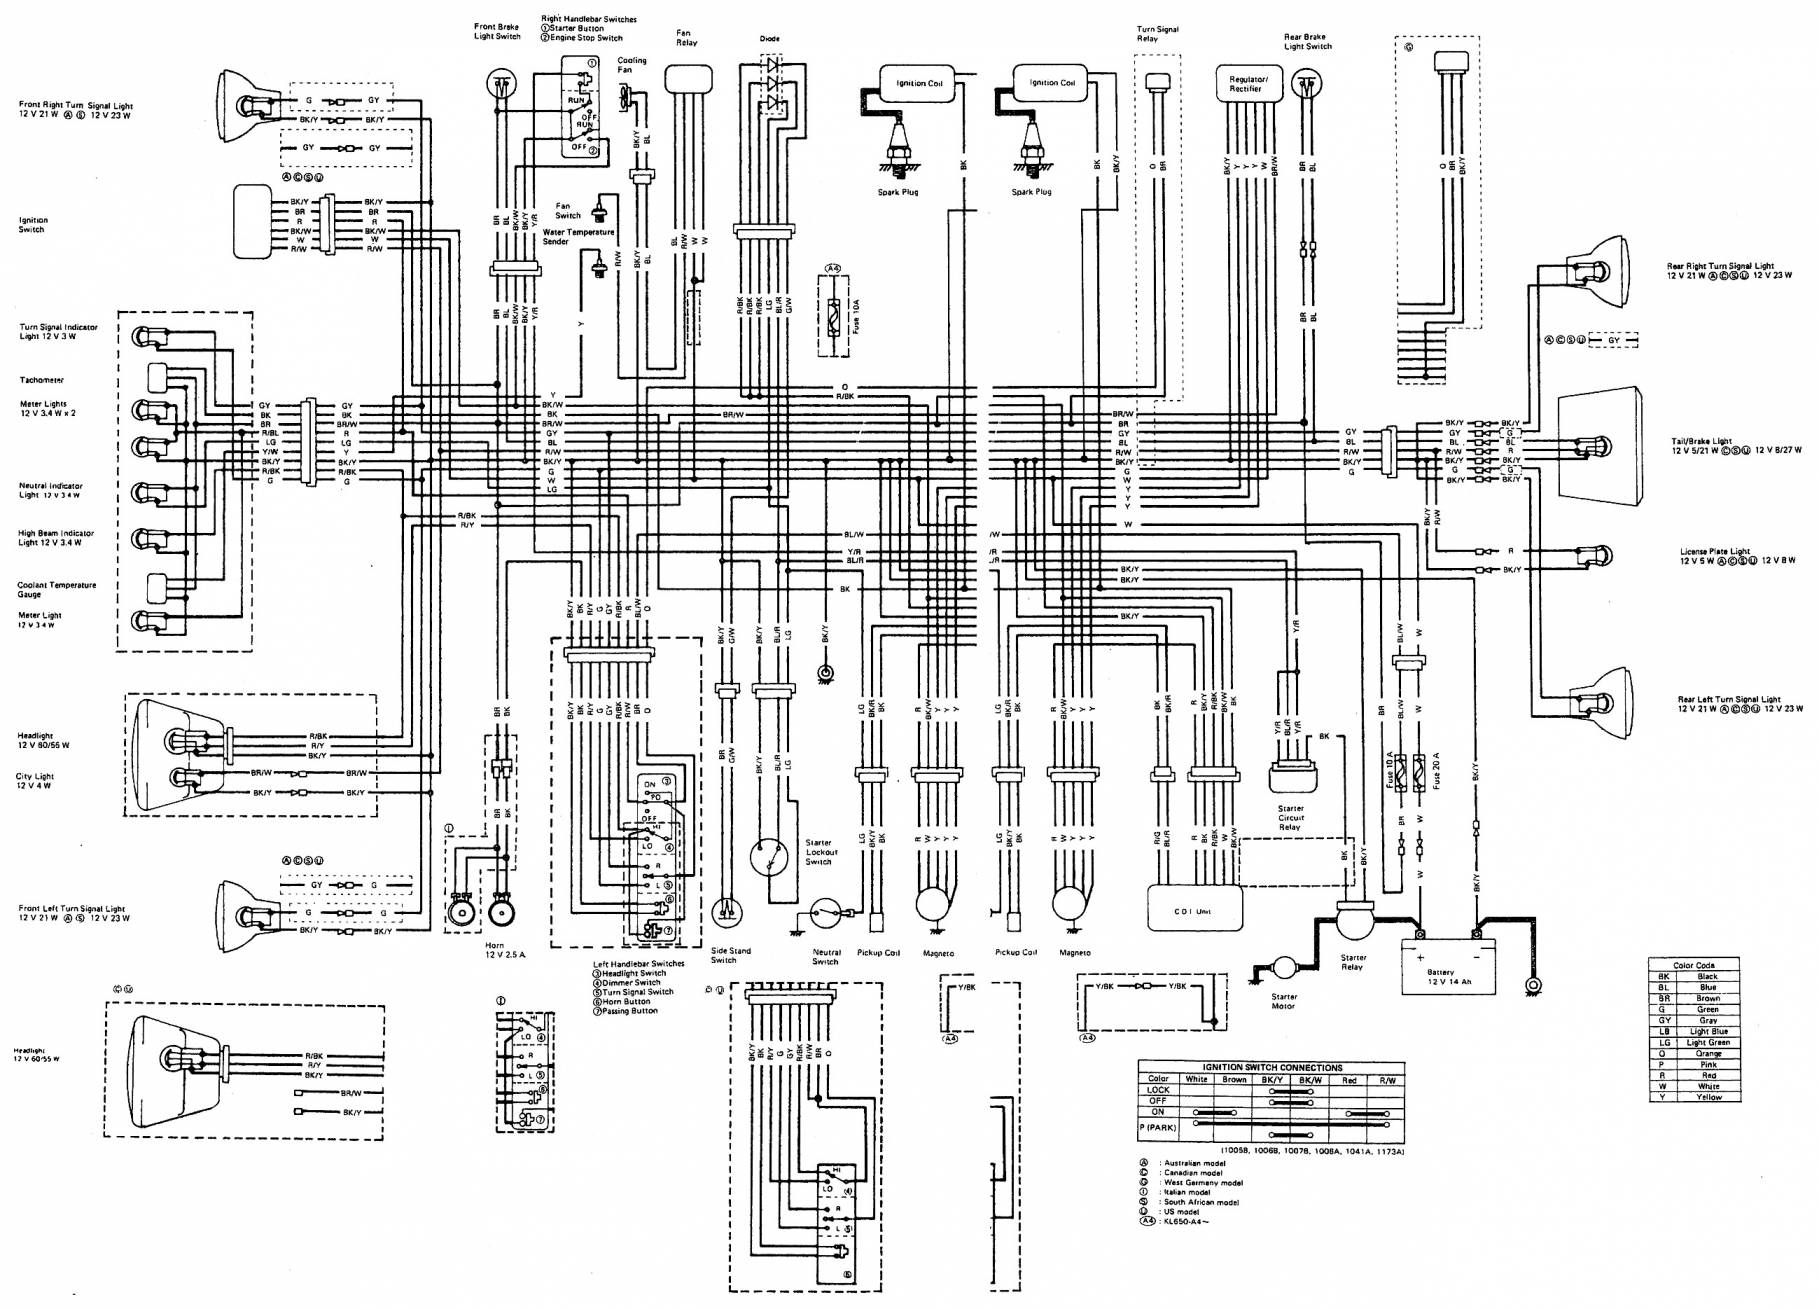 10+ Versalift Wiring Diagram in 2021 | Toyota, Diagram, Toyota previaPinterest